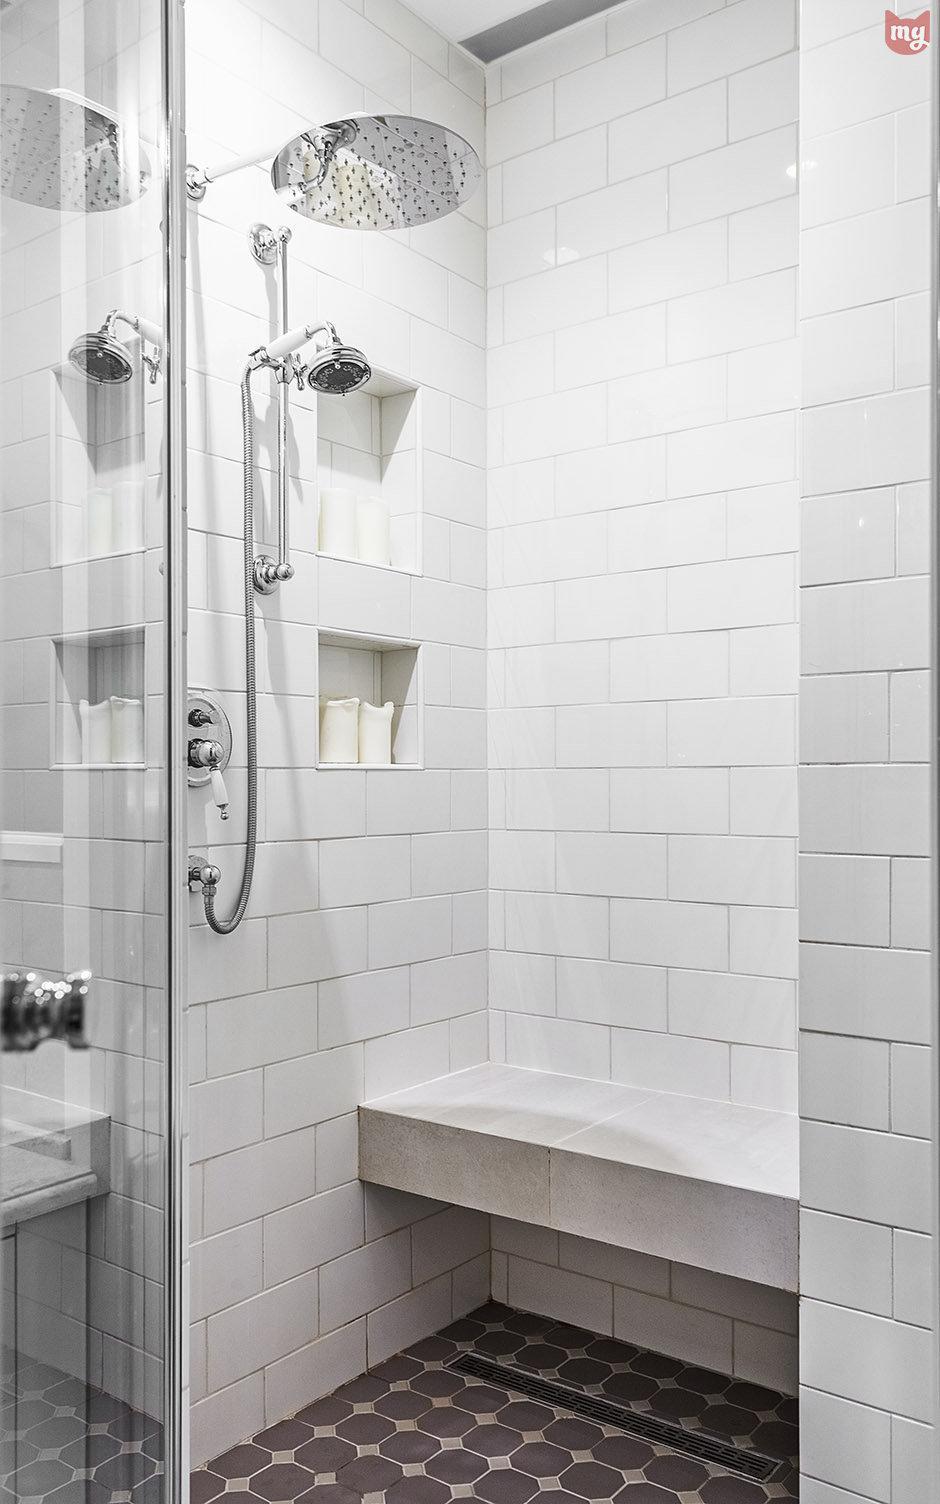 Фотография: Ванная в стиле Прованс и Кантри, Квартира, Проект недели, Наталья Сорокина – фото на InMyRoom.ru